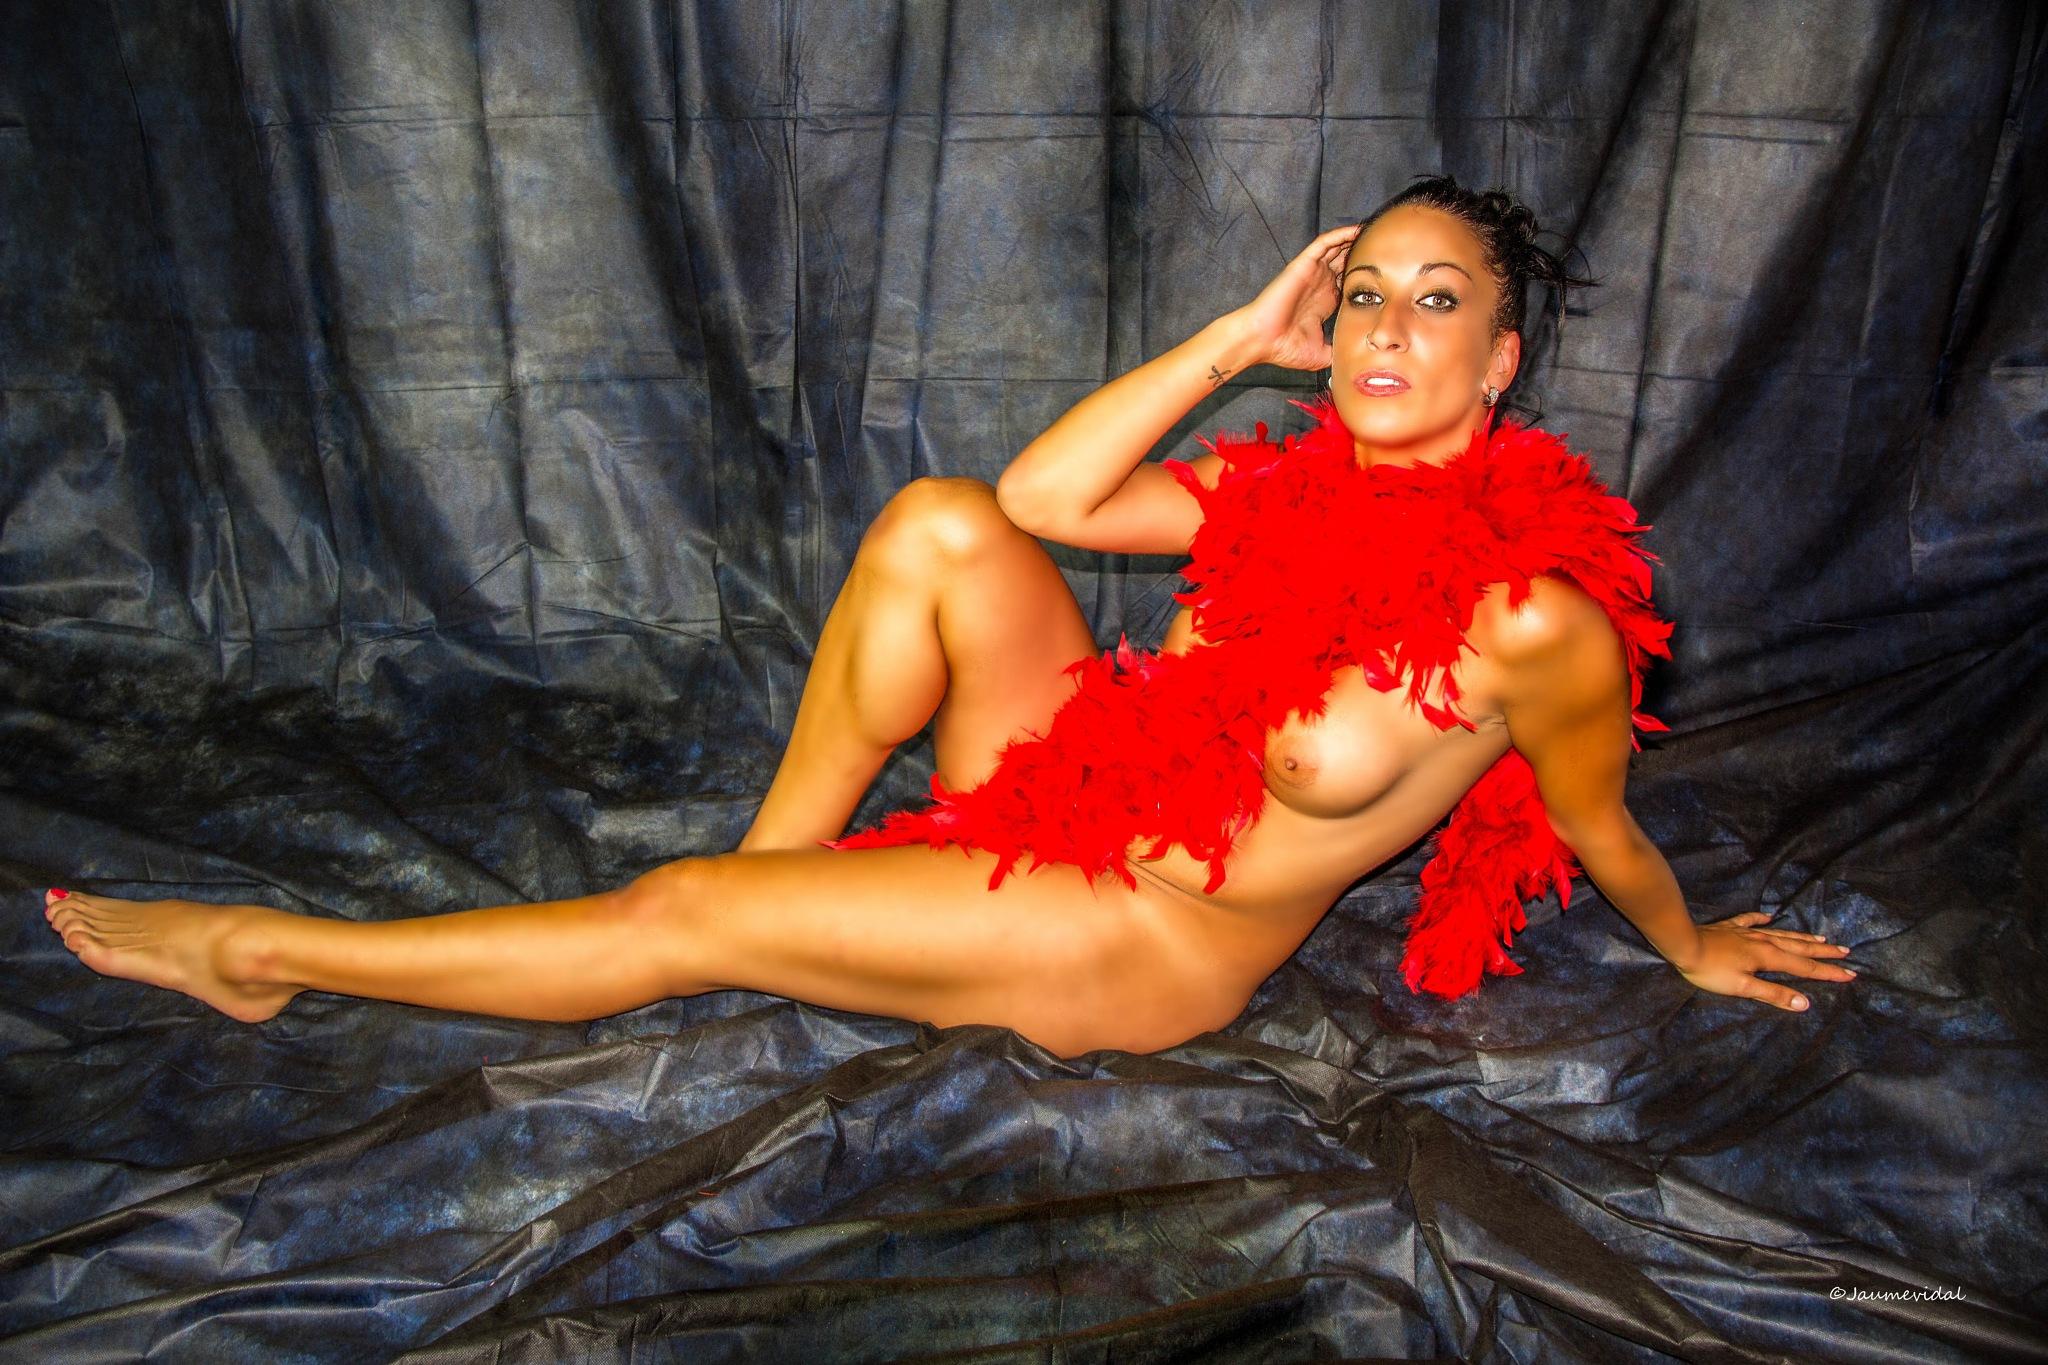 Lorena in dark room by JaumeVidal